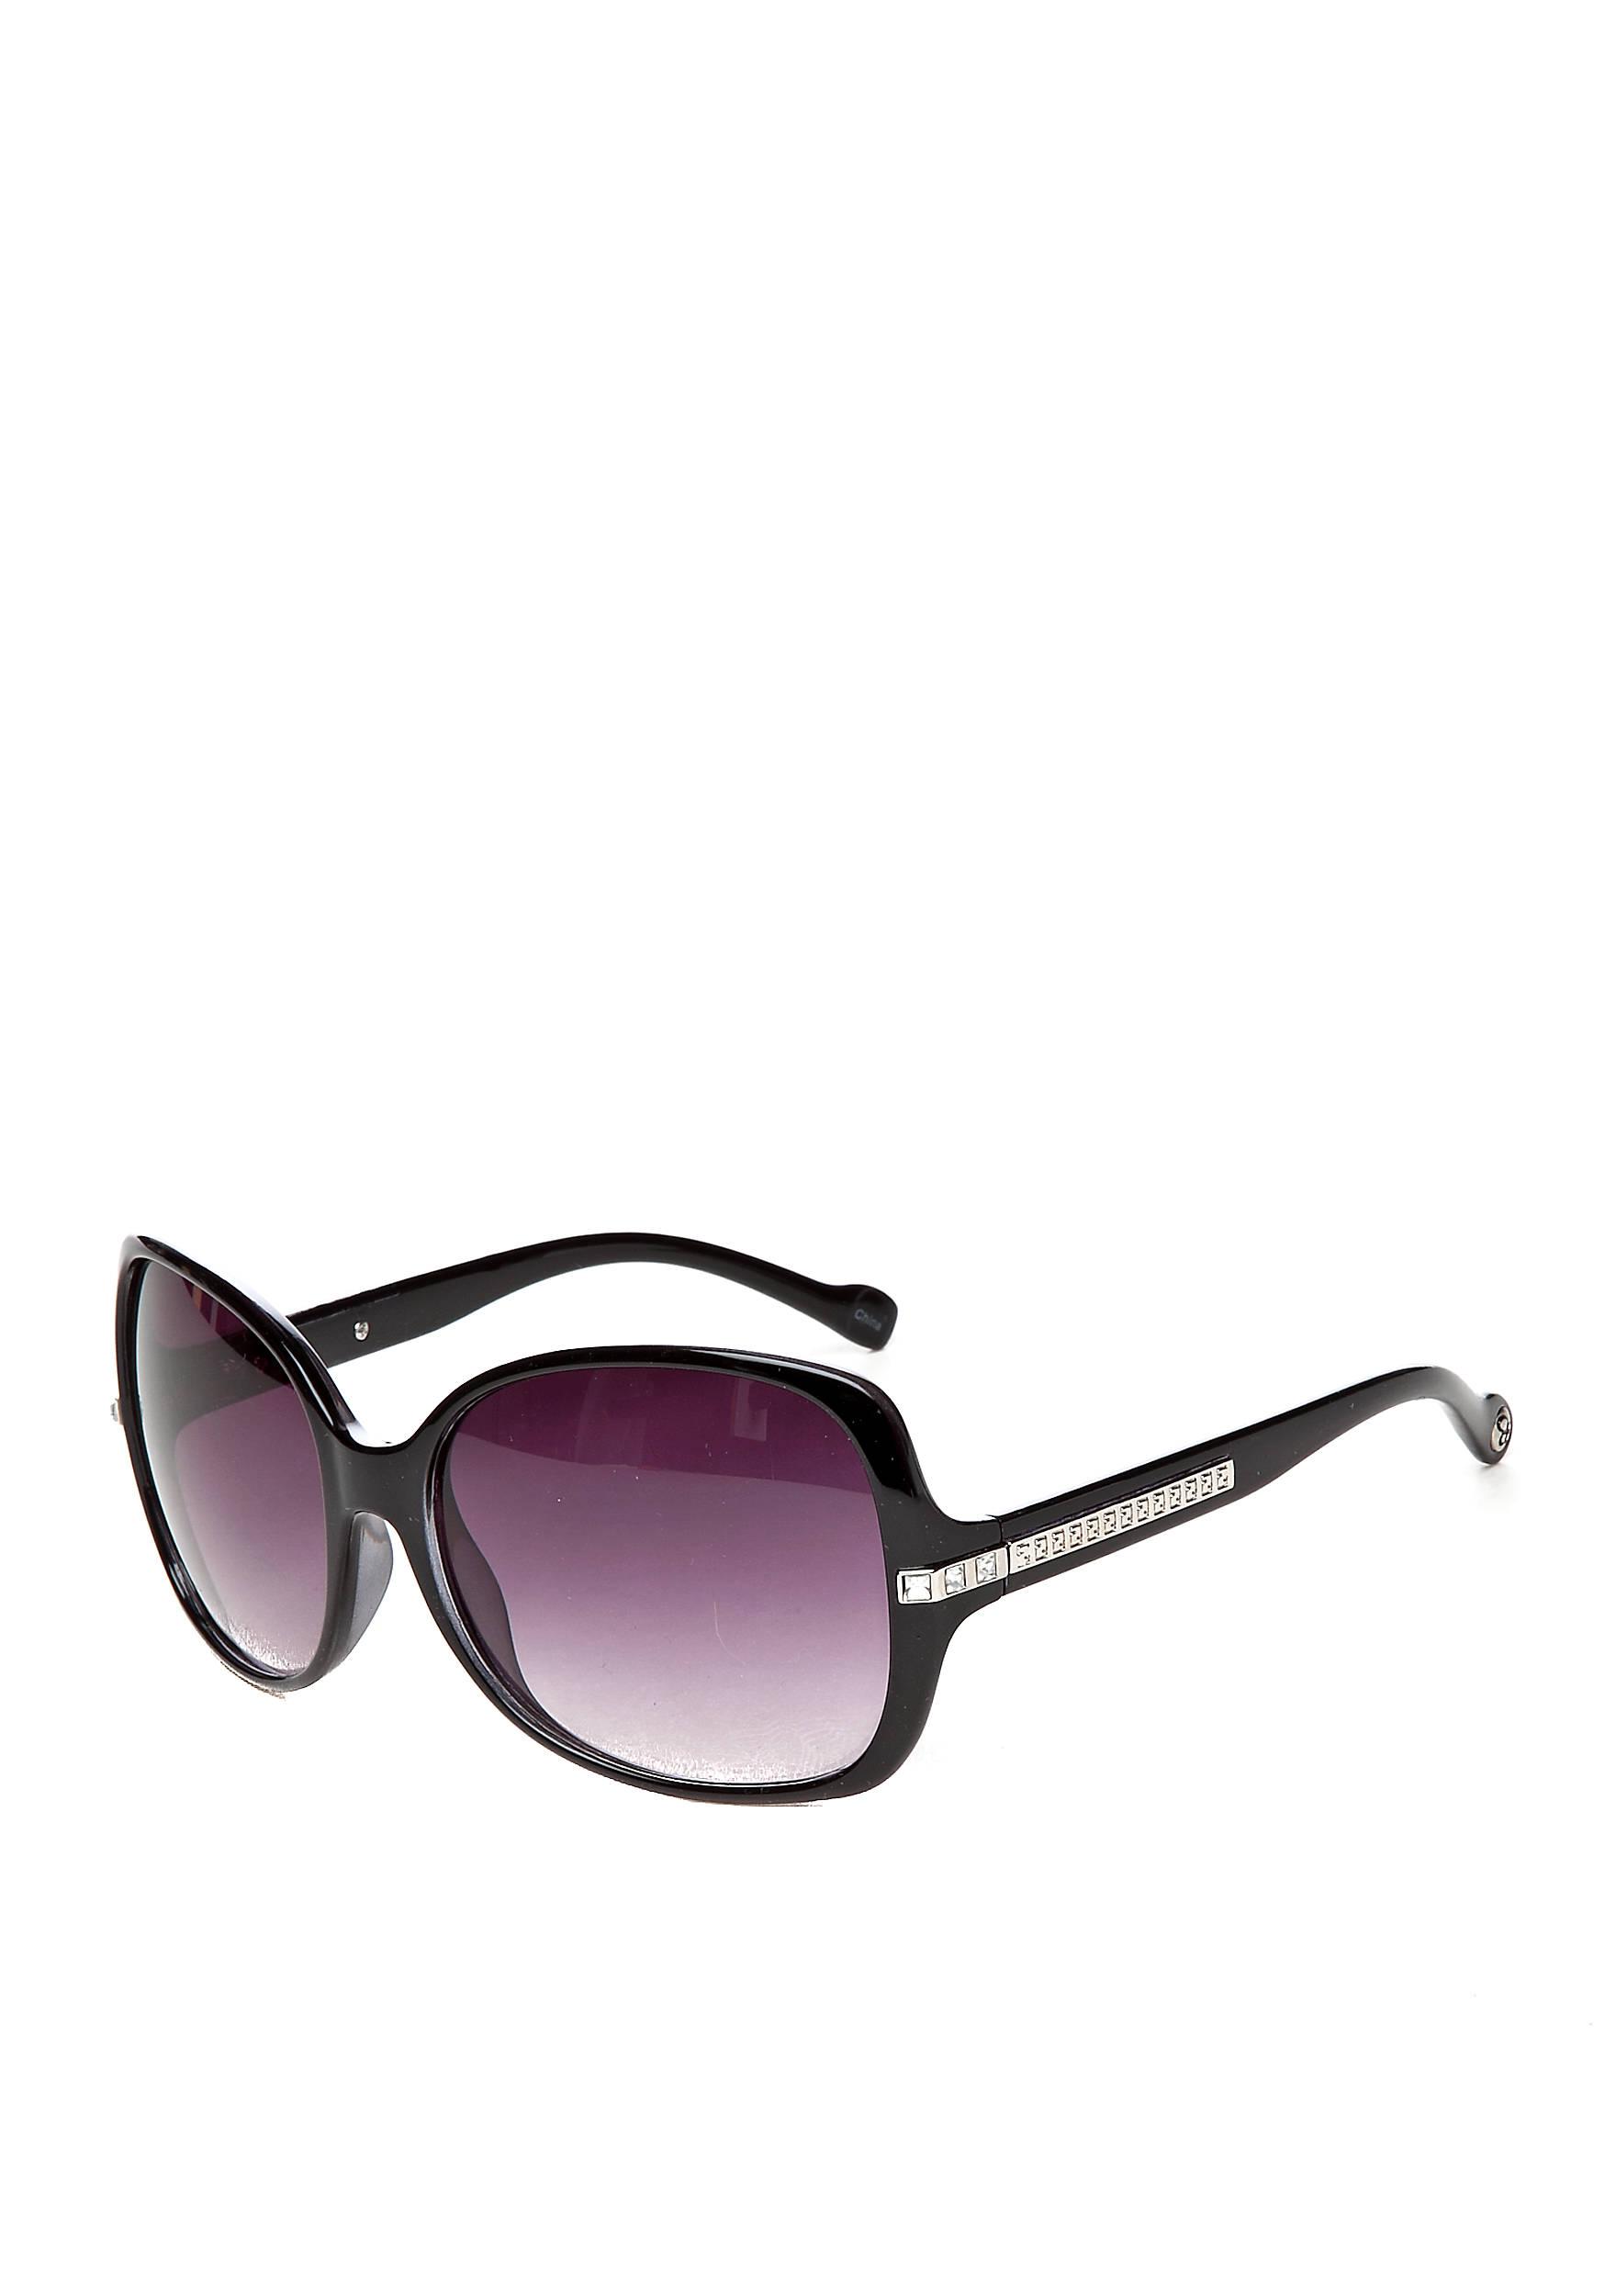 a633452e5f Jessica Simpson Glam Plastic with Rhinestone Detail Sunglasses